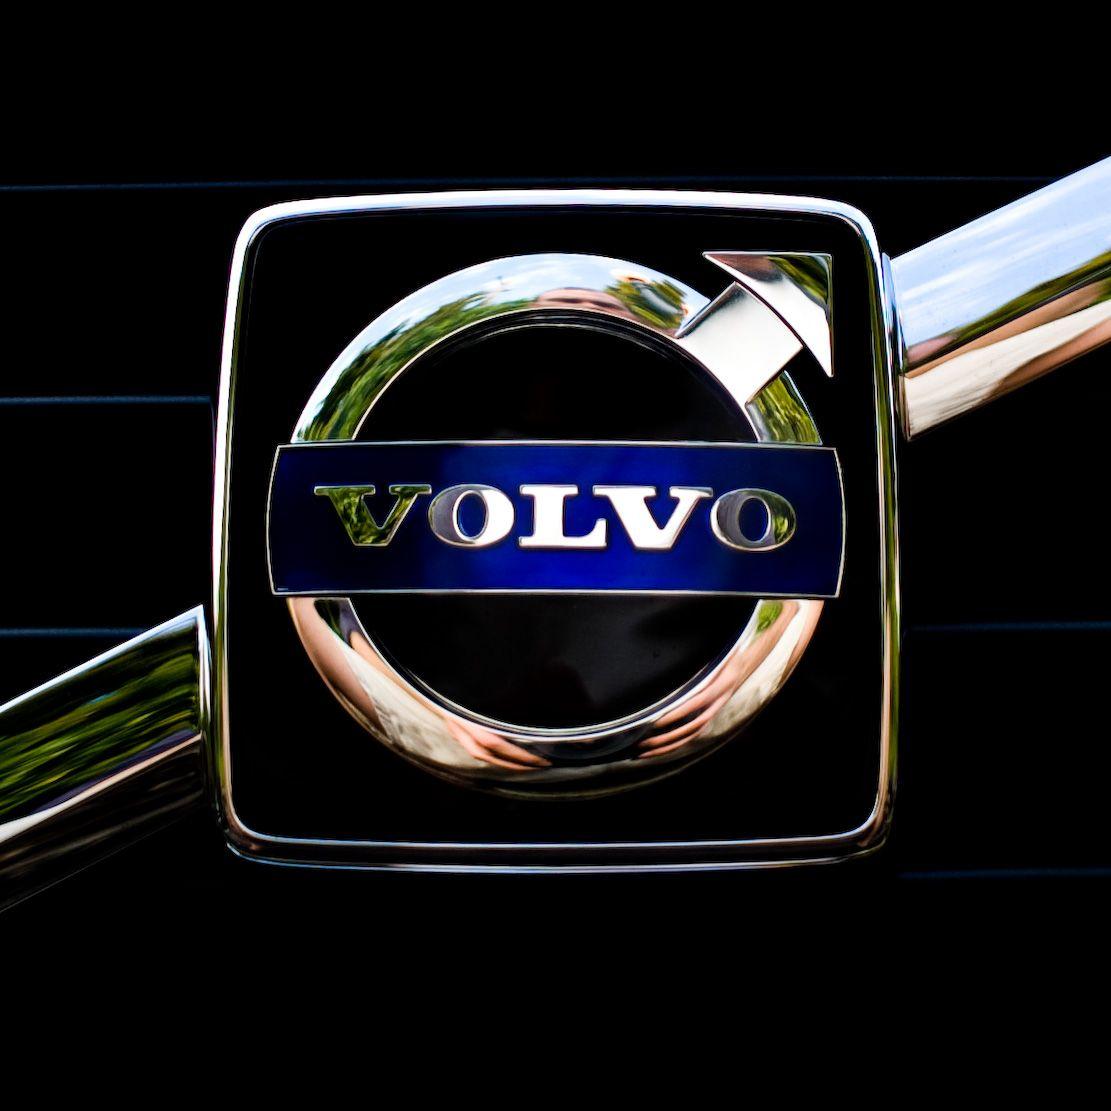 Volvo Logo Wallpaper High Quality Resolution Q5x Volvo